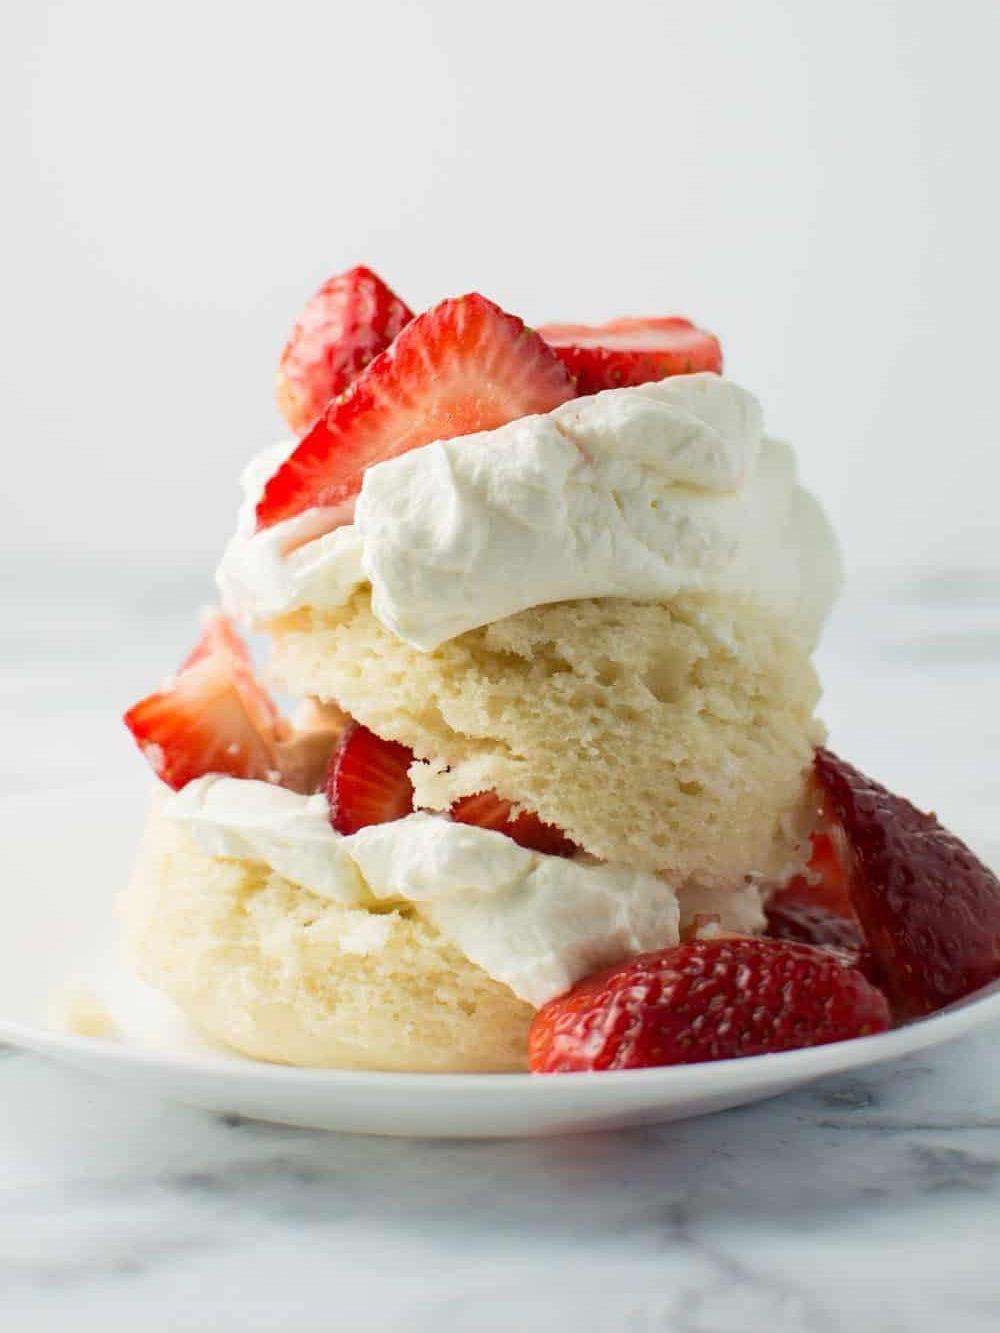 00-FEATURE-single-serving-desserts-domino-mug-strawberry-shortcake